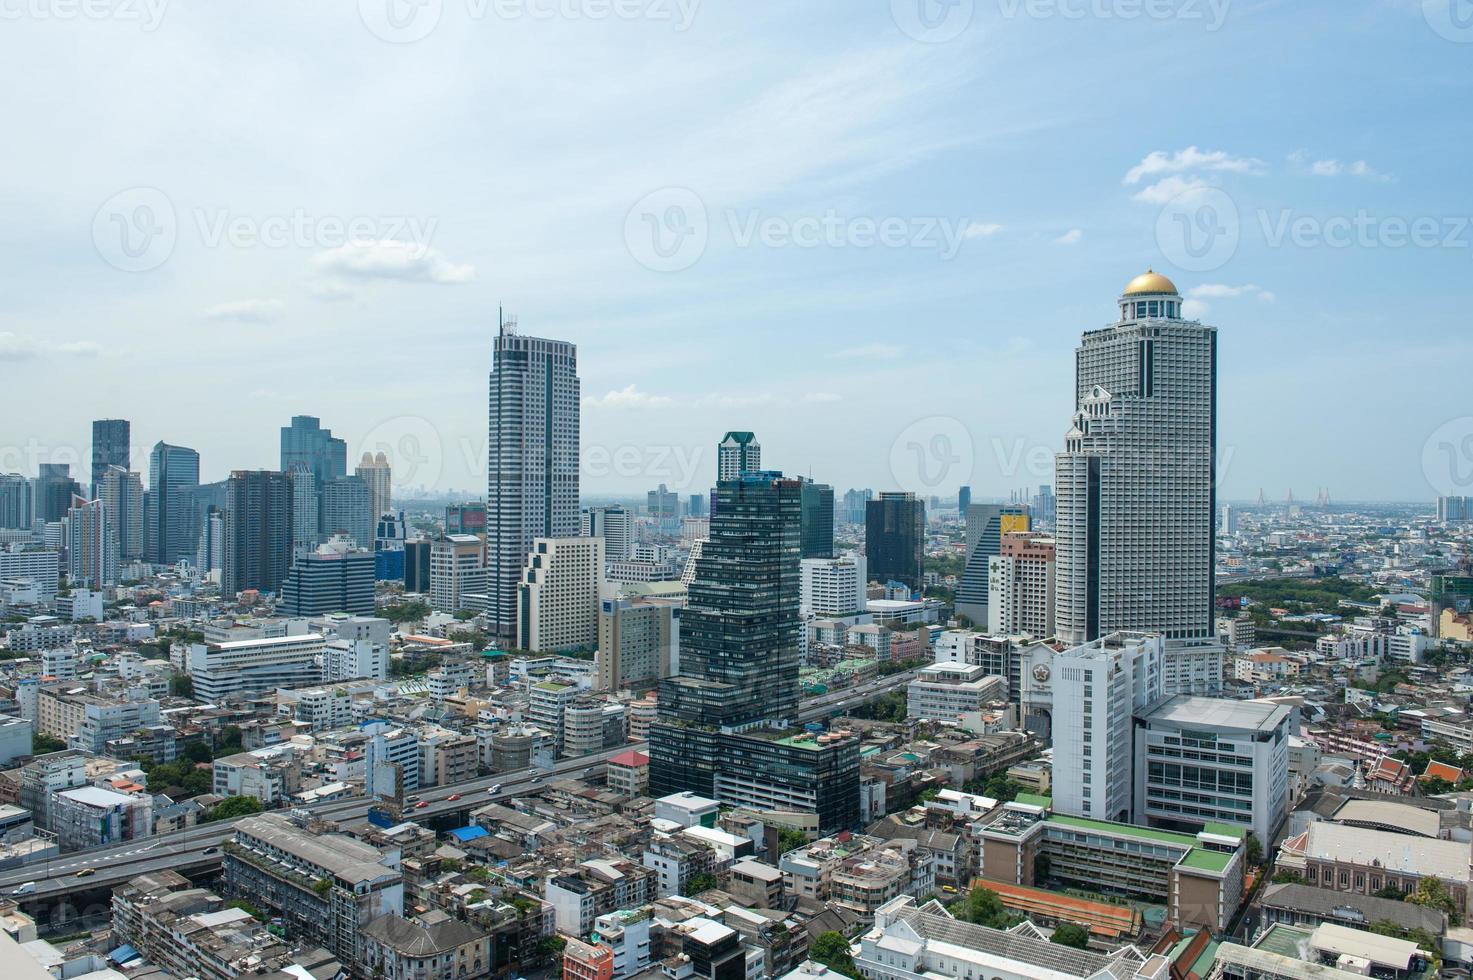 stadsgezicht van bangkok 01 foto